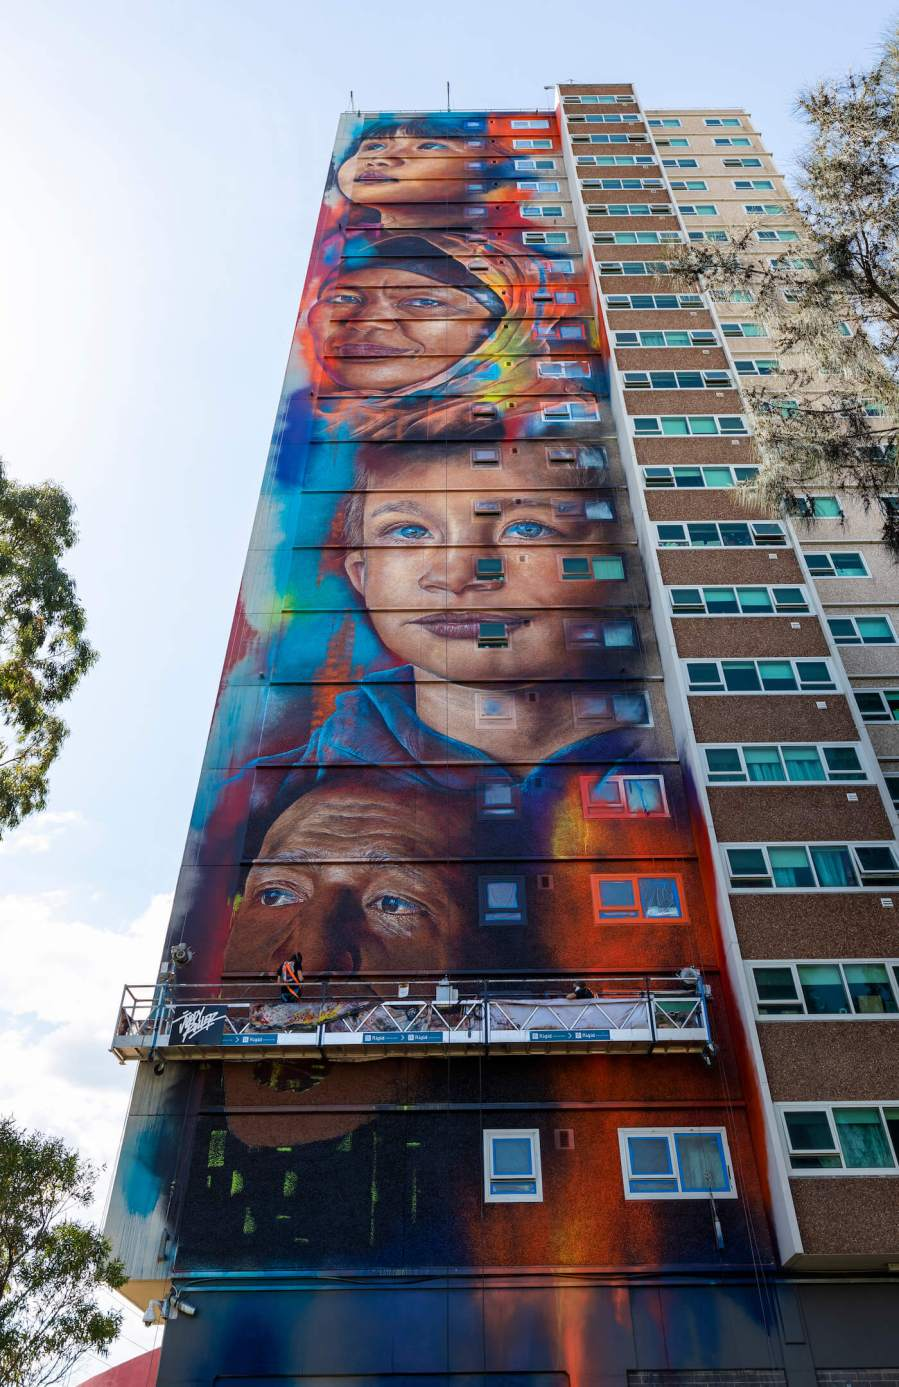 Adnate-street-art-australia-juddy-roller-Nicole-Reed-Photography-4